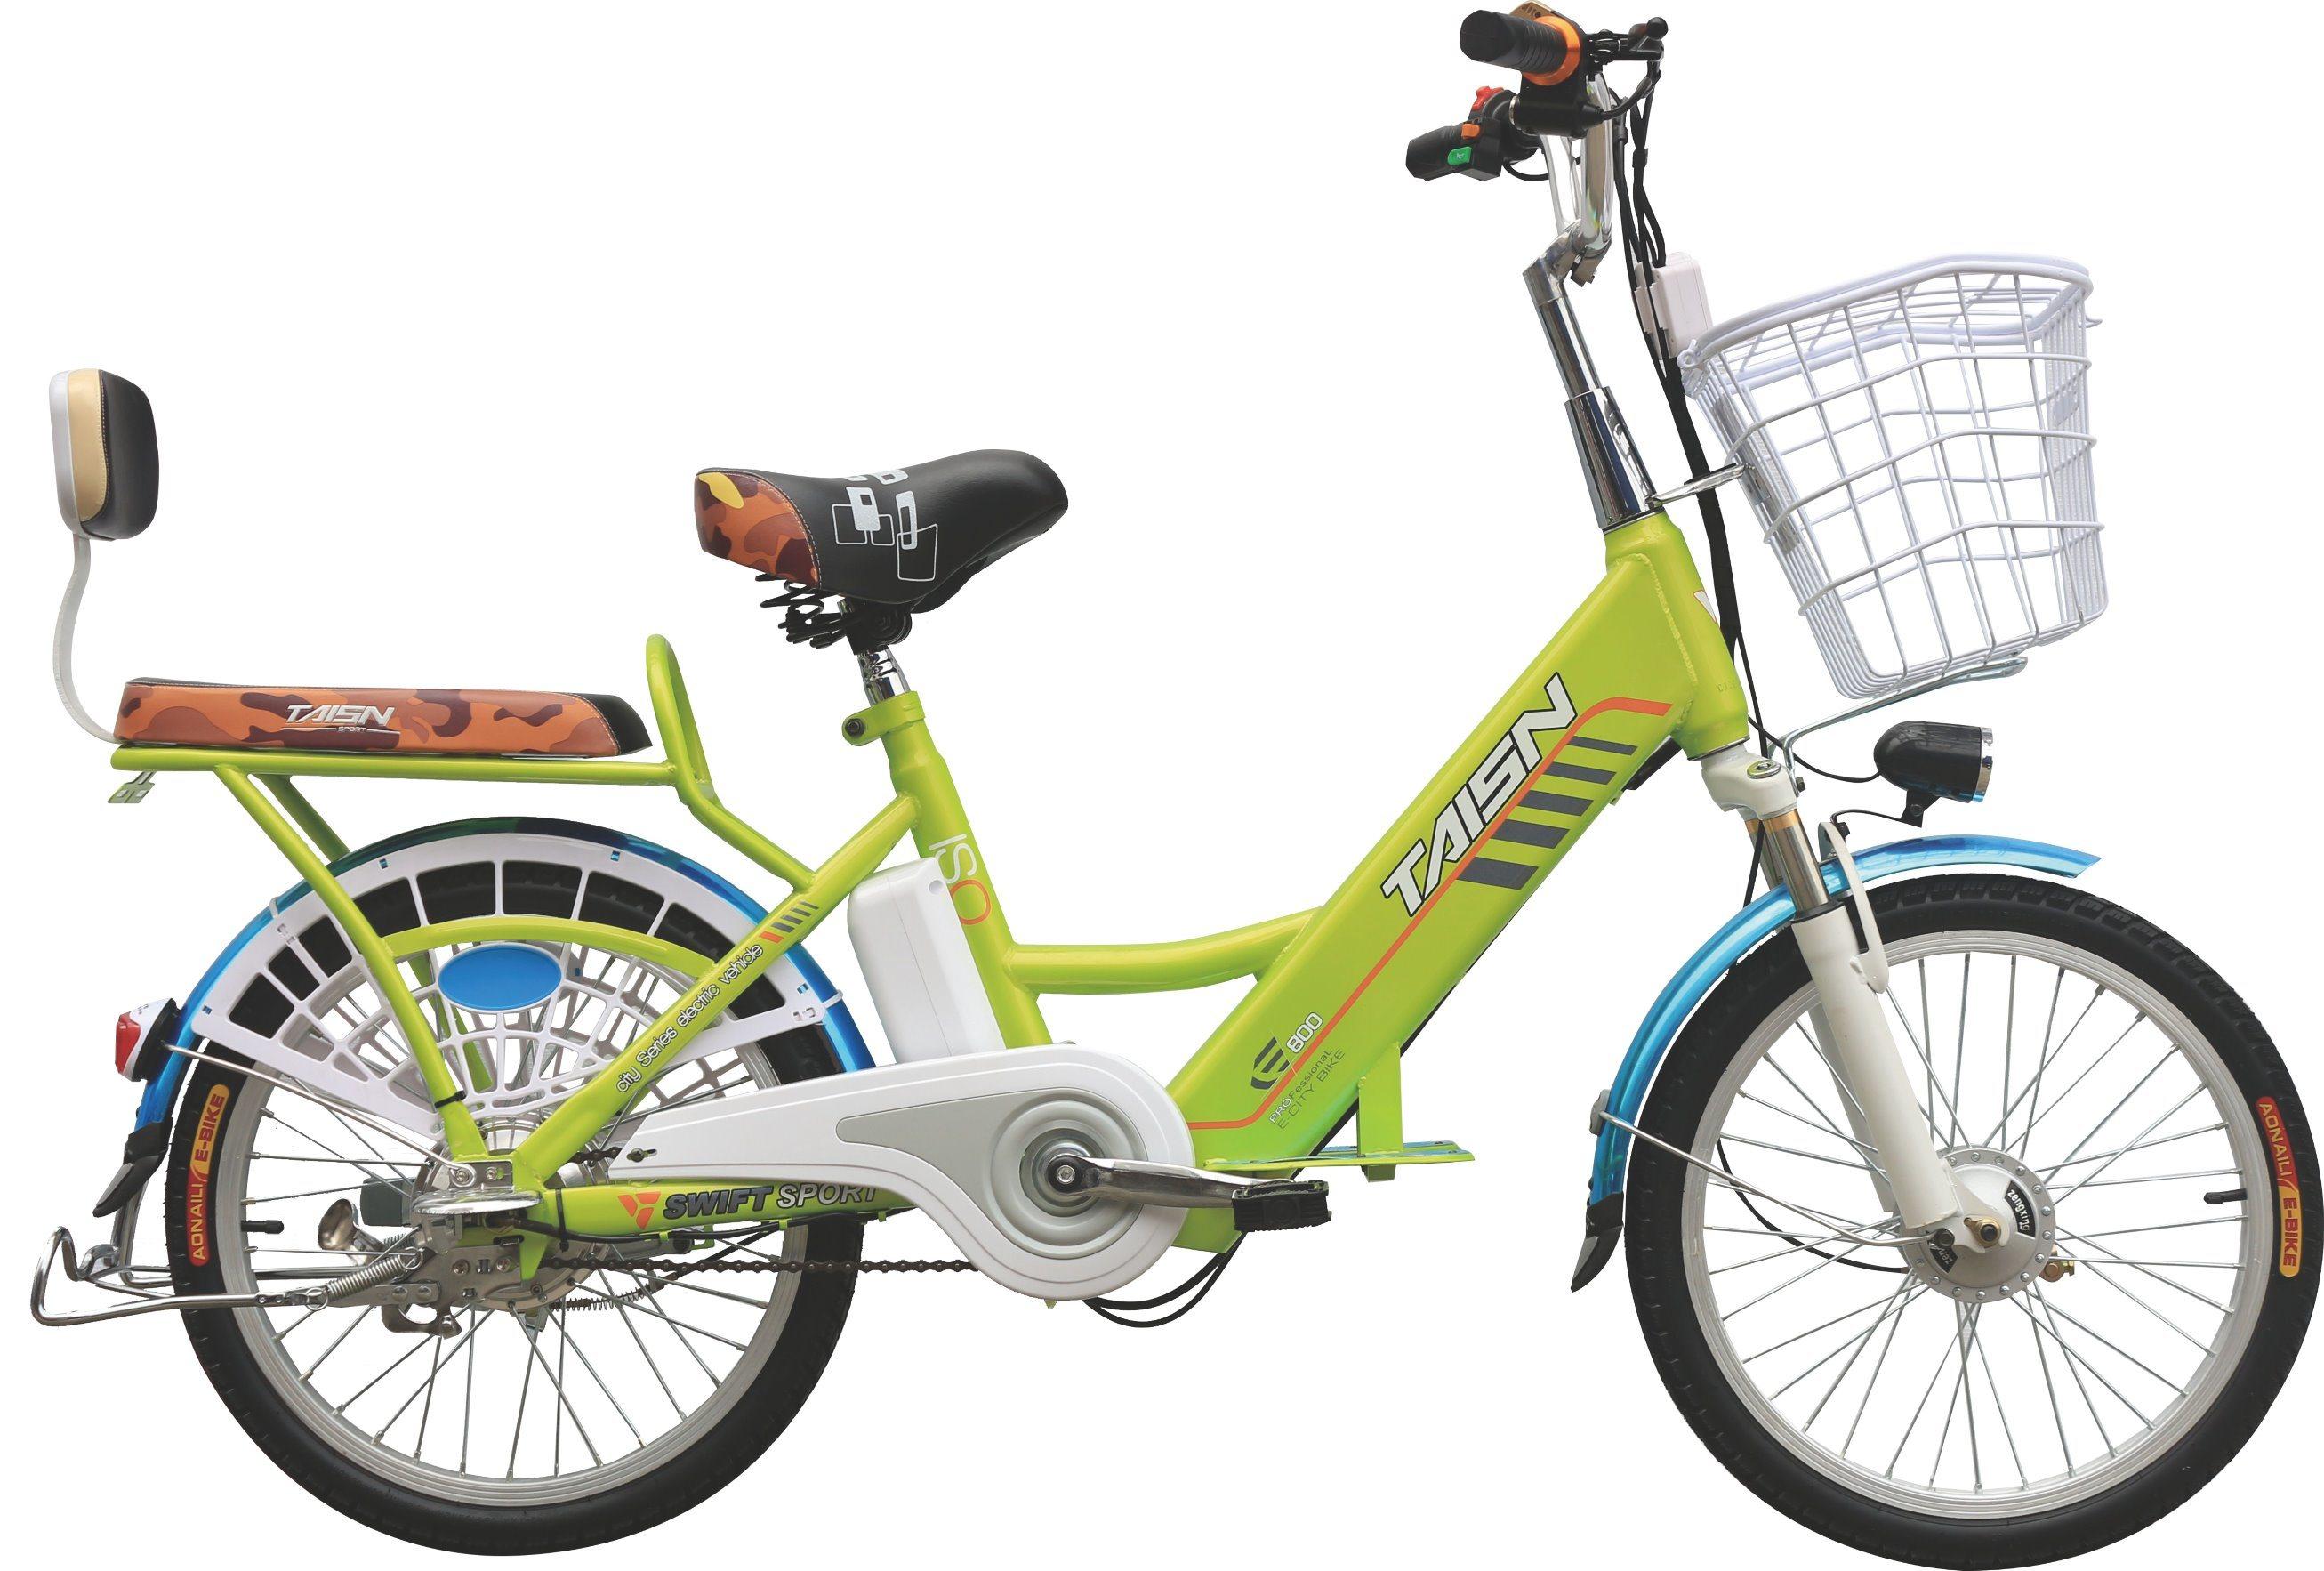 Sondors Electric Bike Accessories